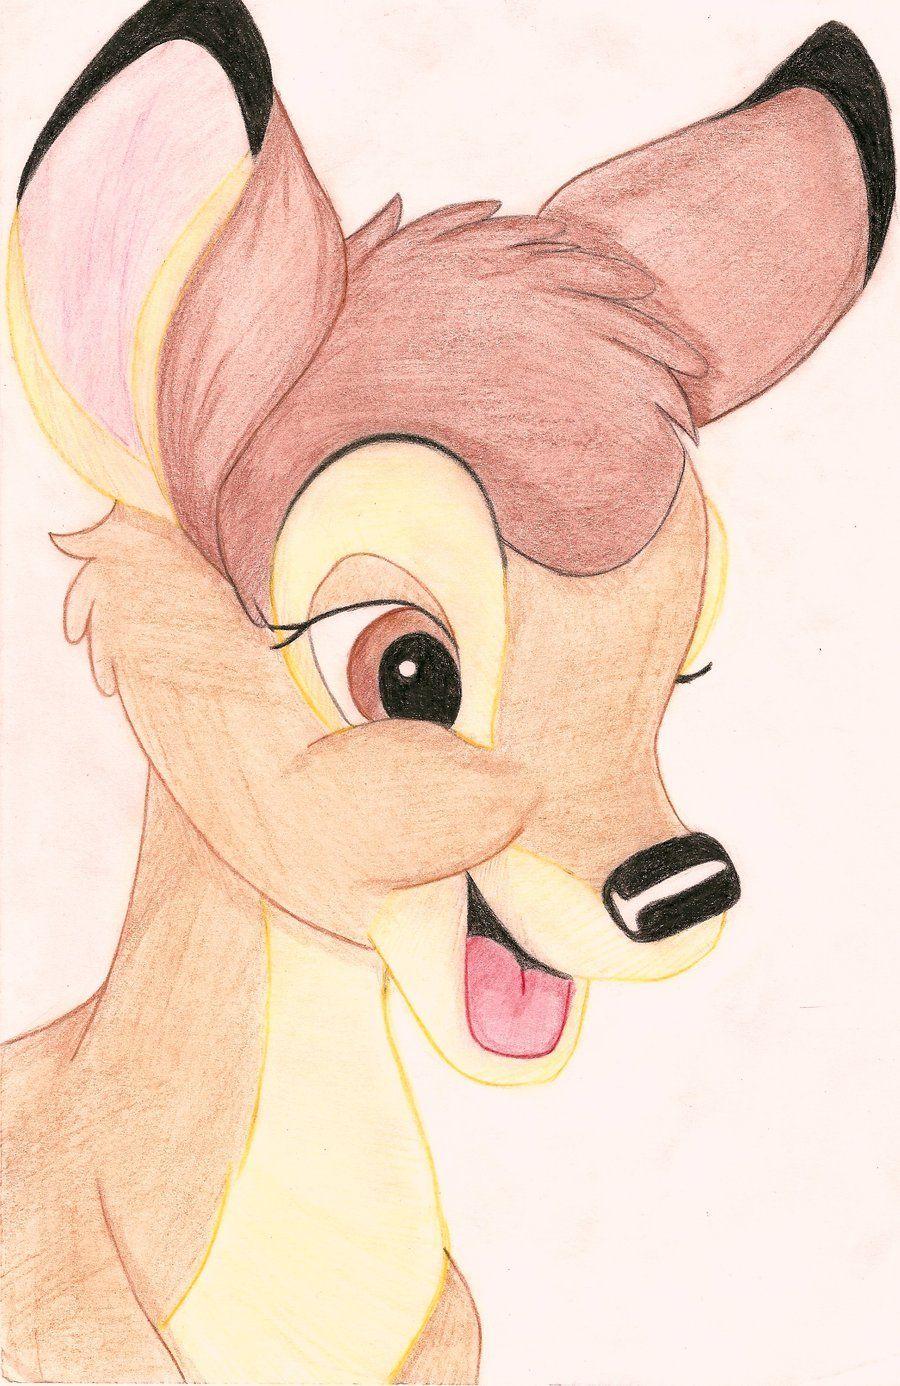 Bambi Drawing In Color By Iranaa On Deviantart Disney Character Drawings Disney Drawings Sketches Cartoon Drawings